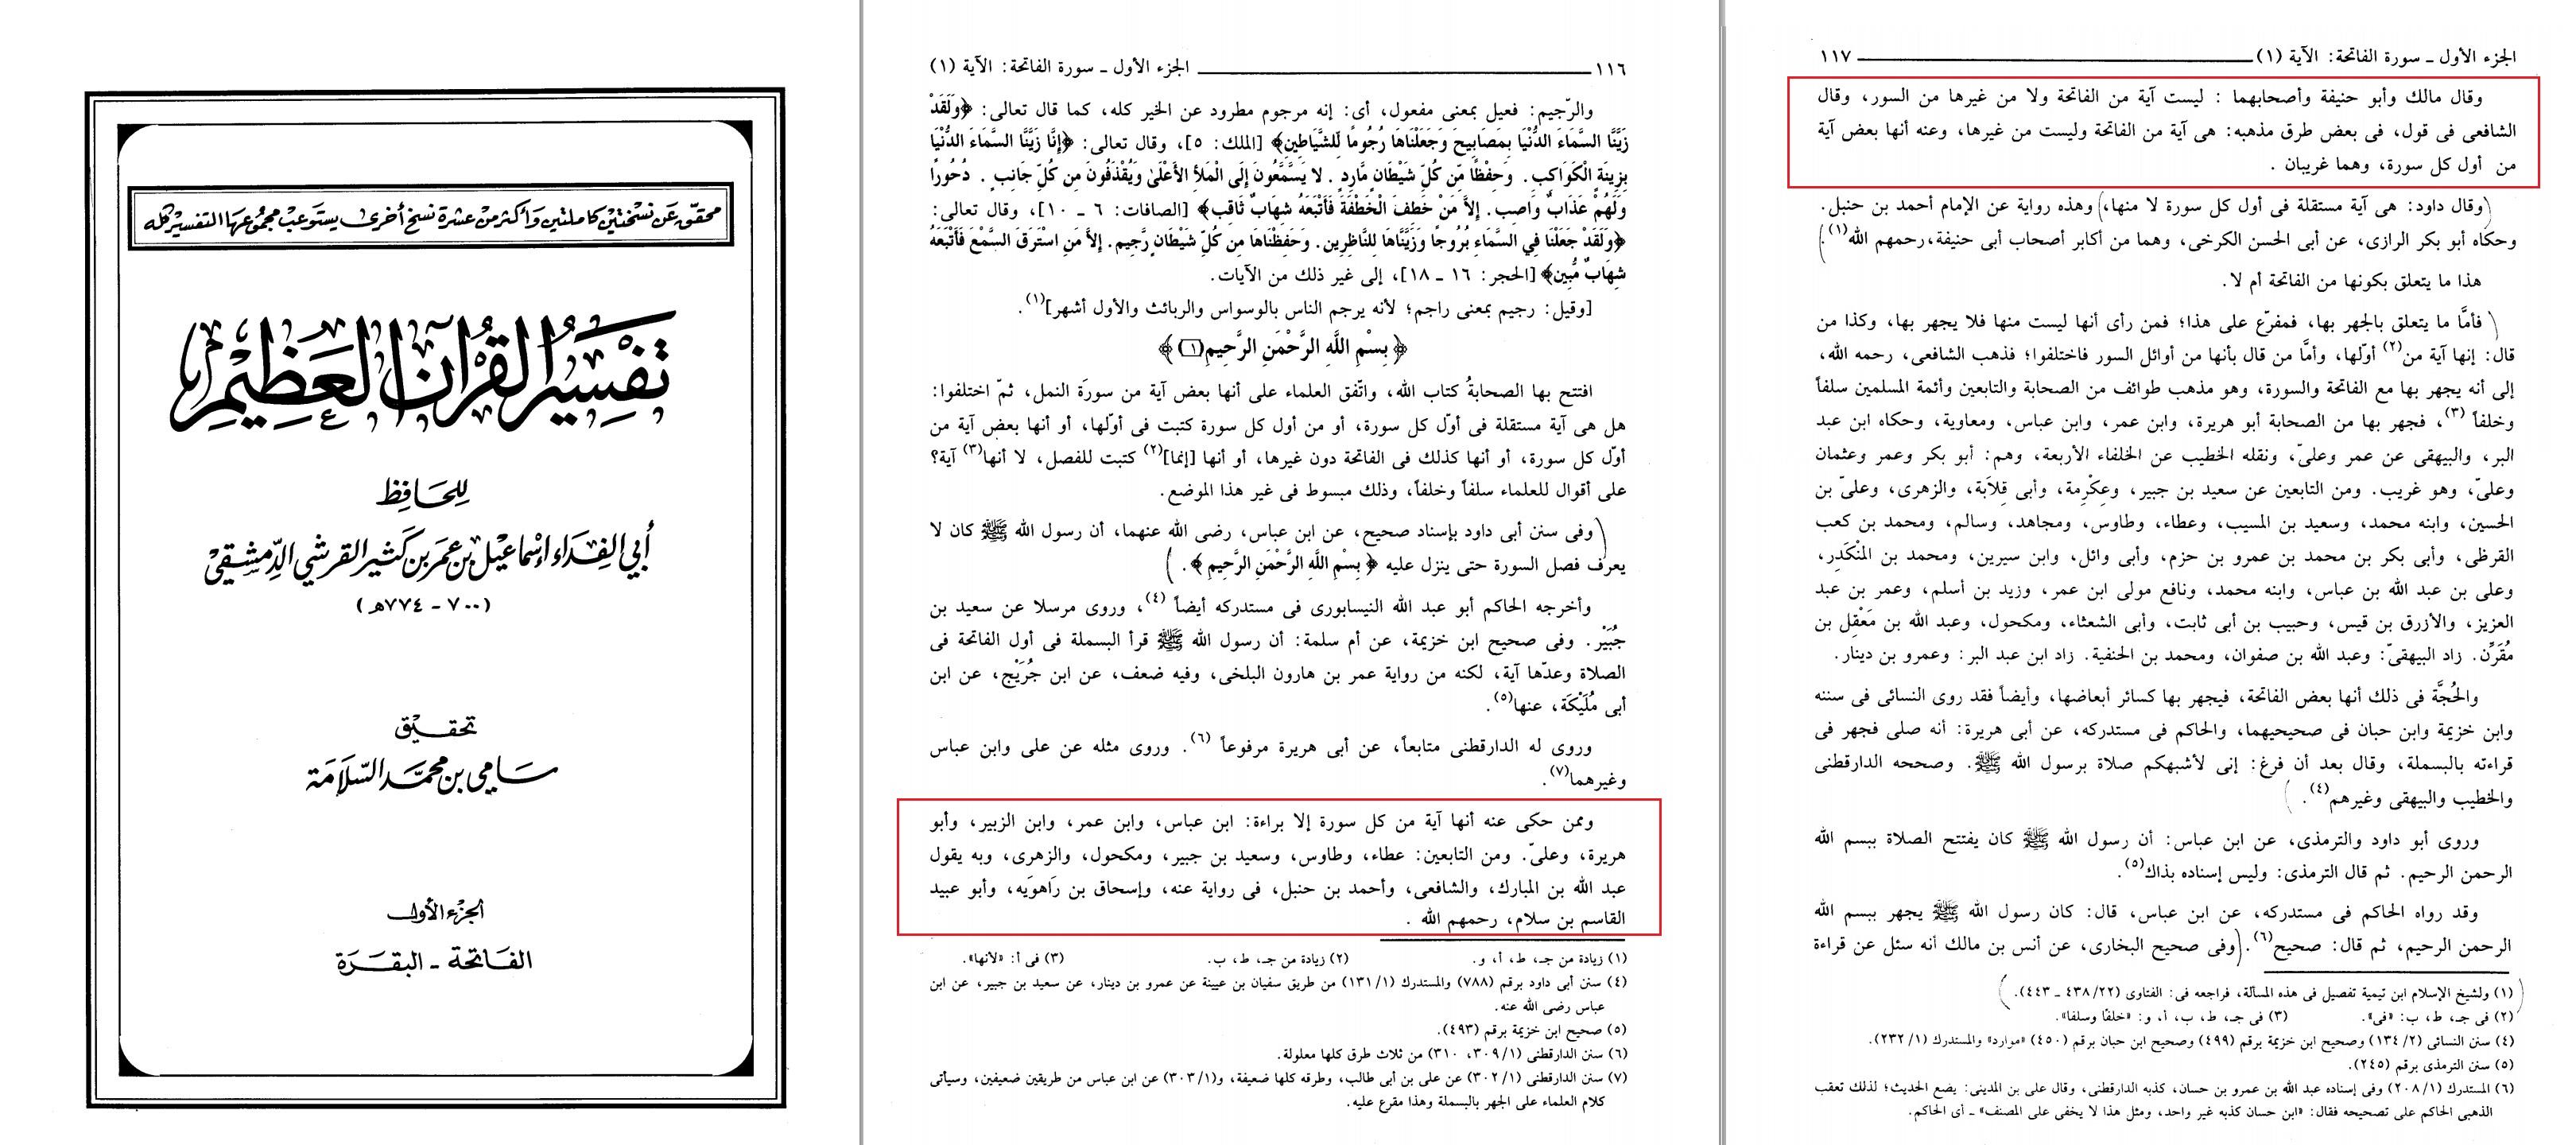 Tafsir Ibn Kathir B - 1 S - 116